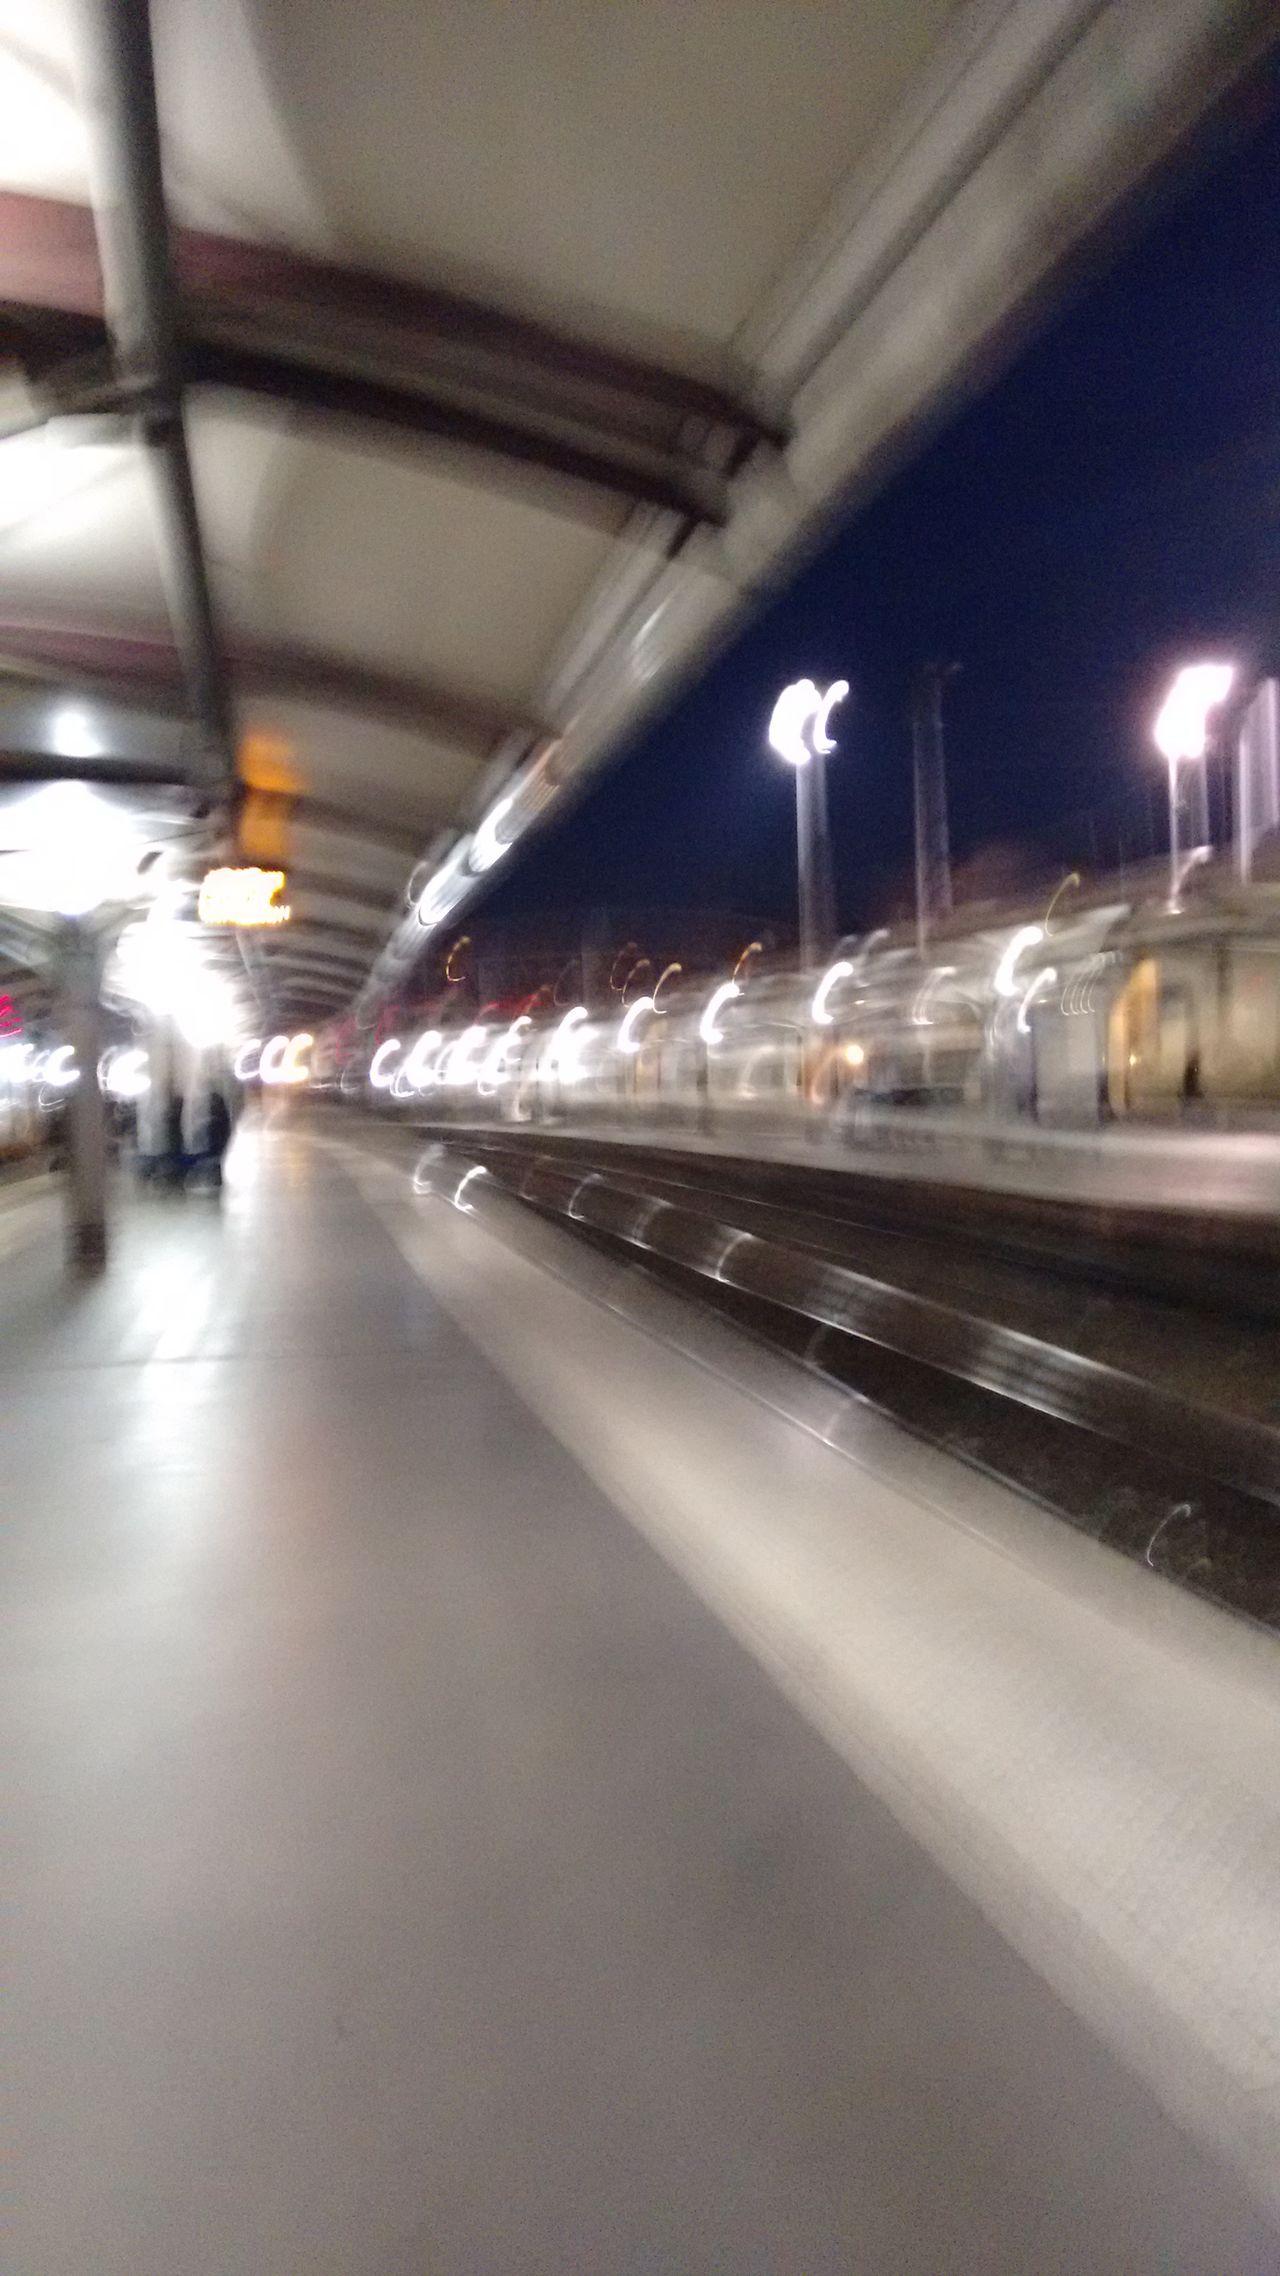 Photography In Motion Train Station Eurostar Paris London Travel The Reason I Travel Travel Life Memories